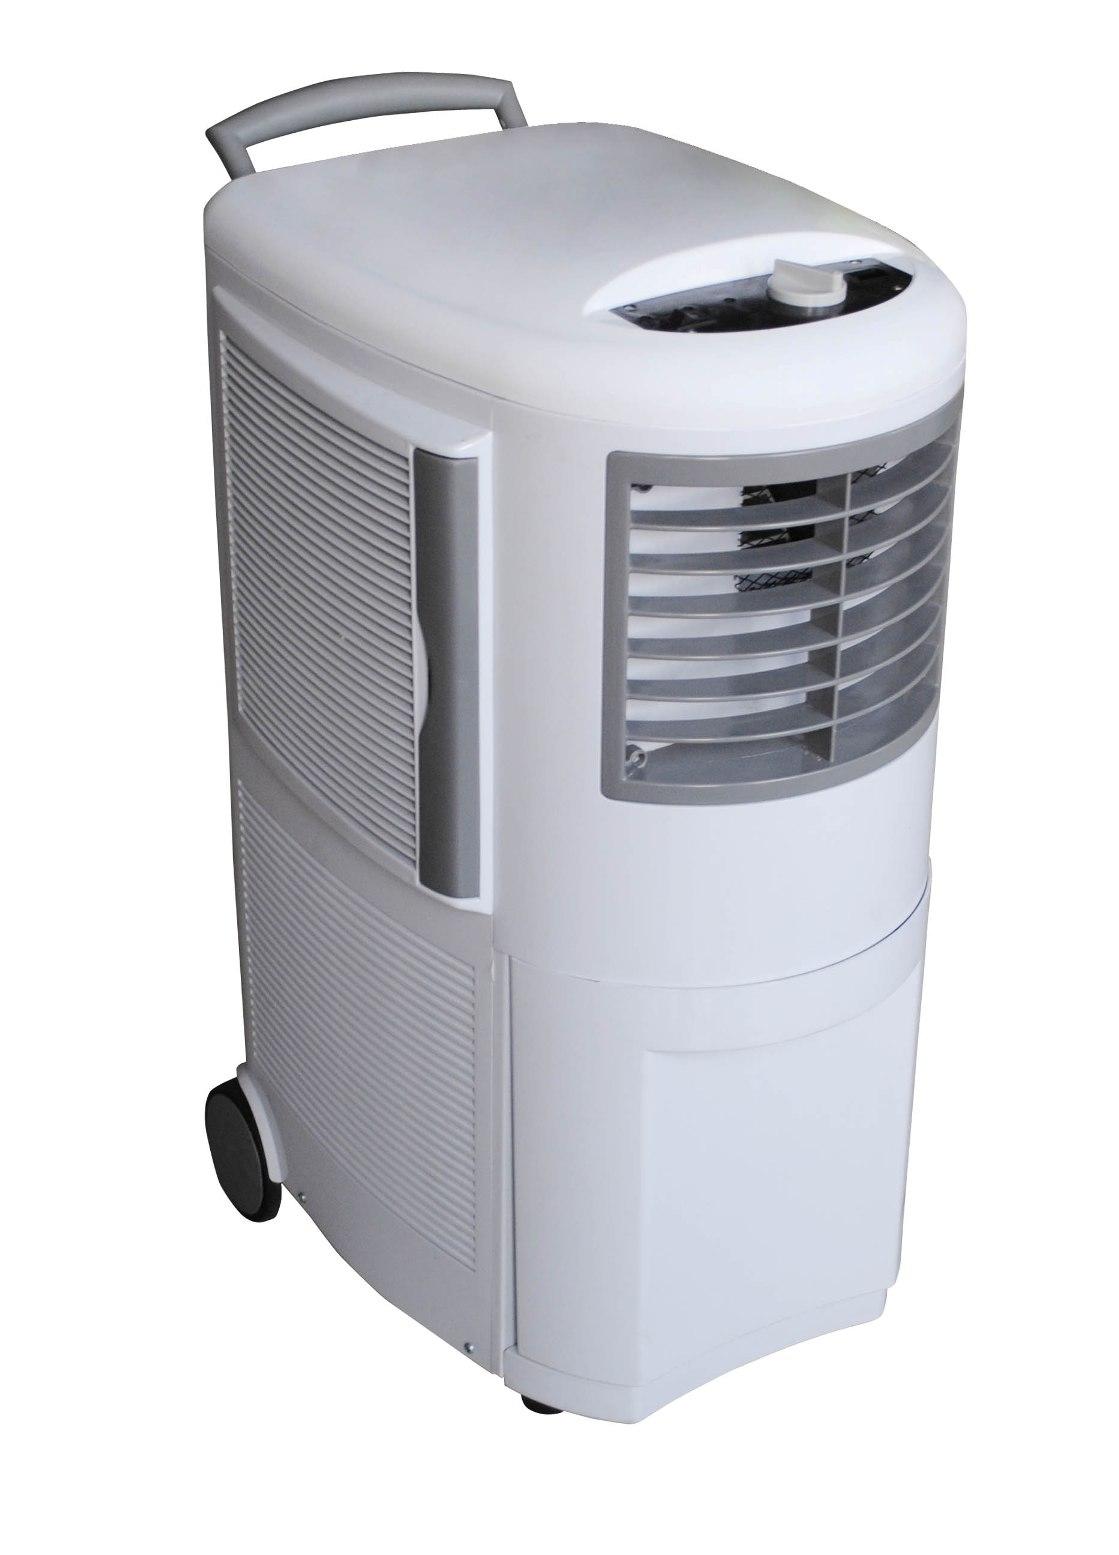 electrolux dehumidifier. category electrolux dehumidifier